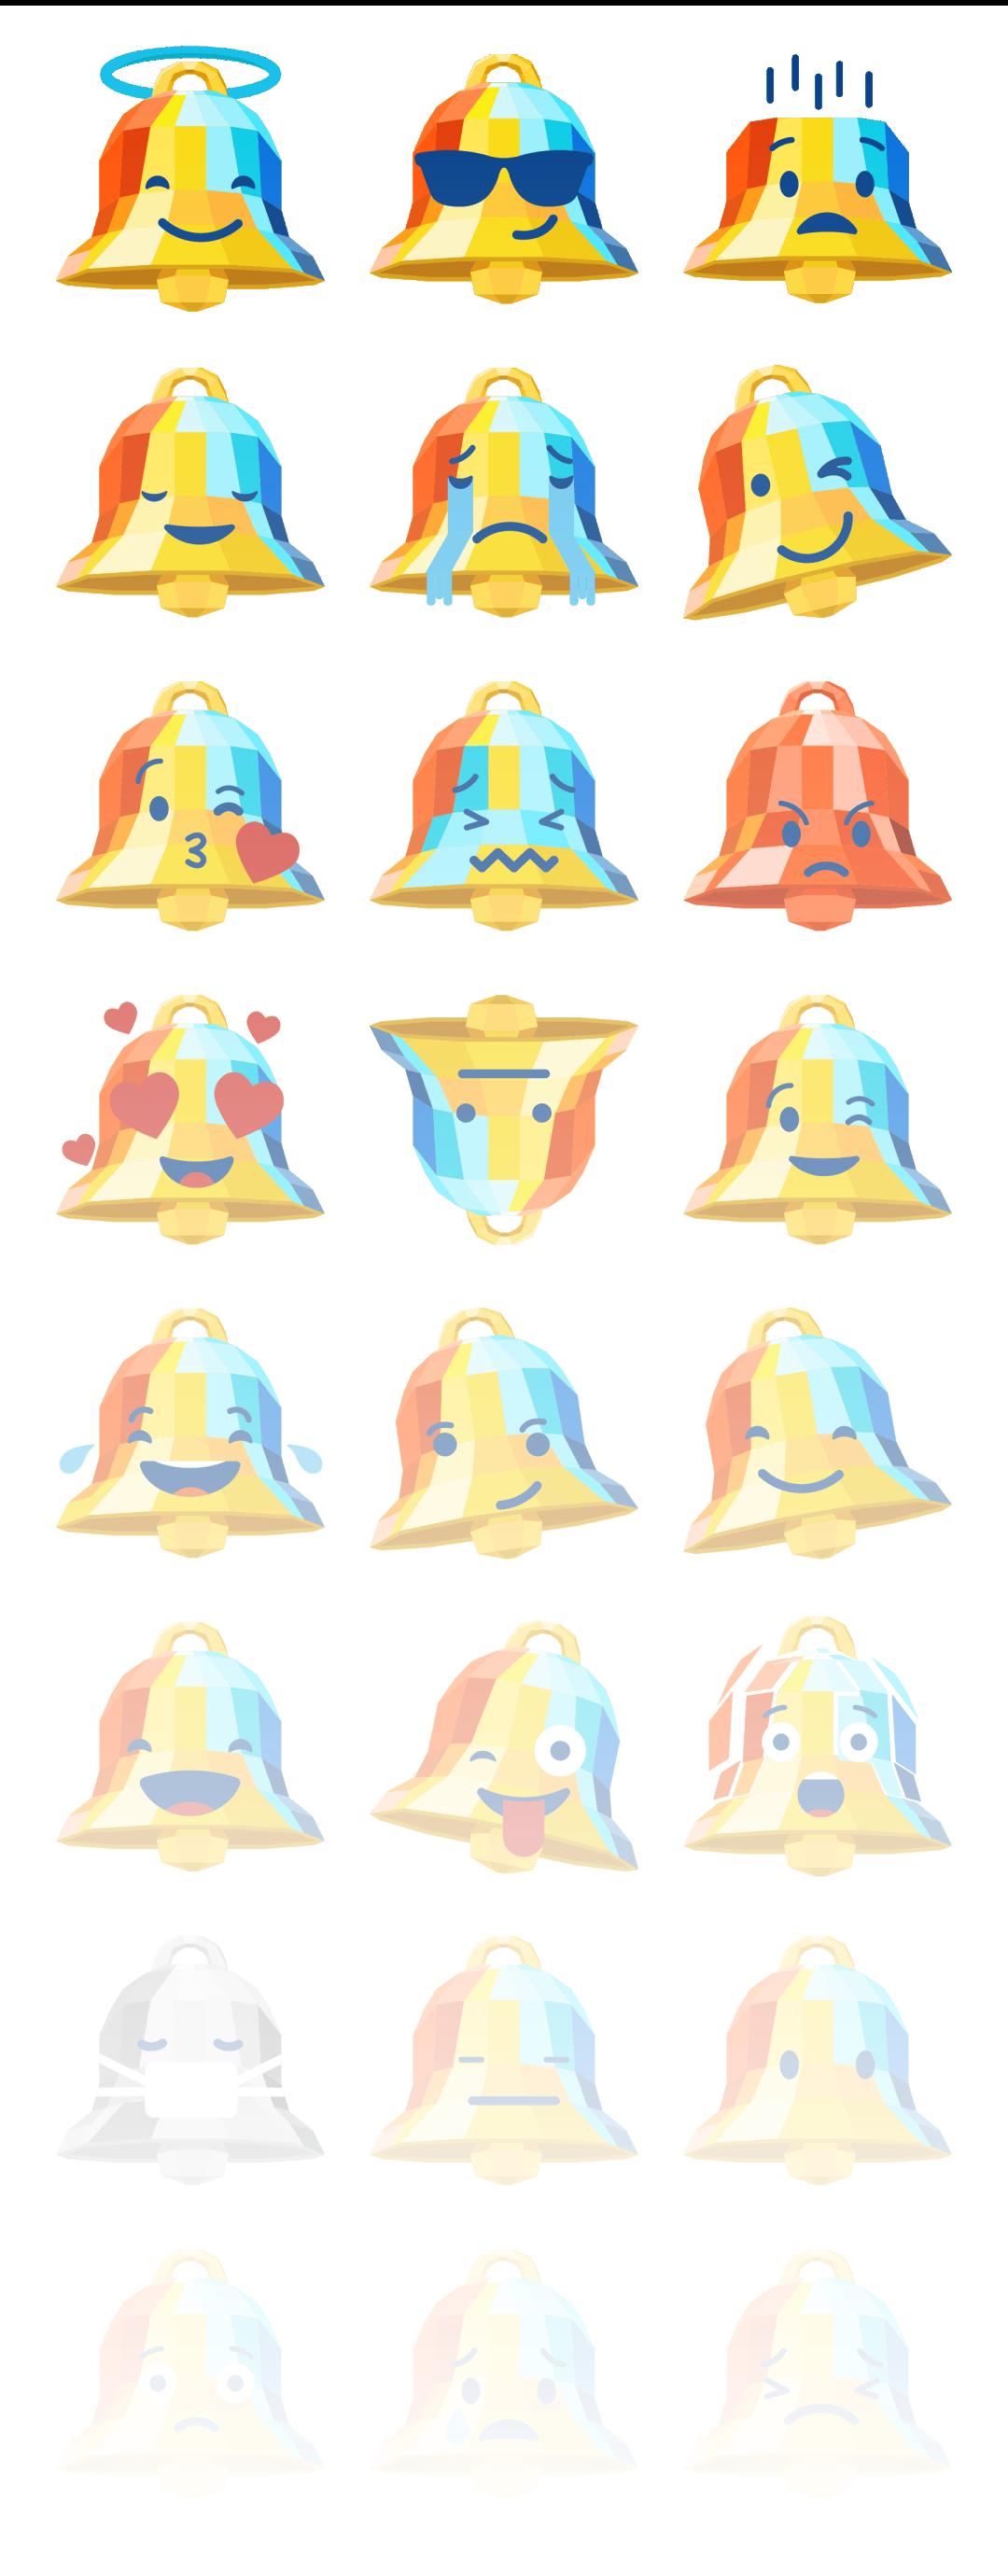 Audiko smile - Stickerpipe